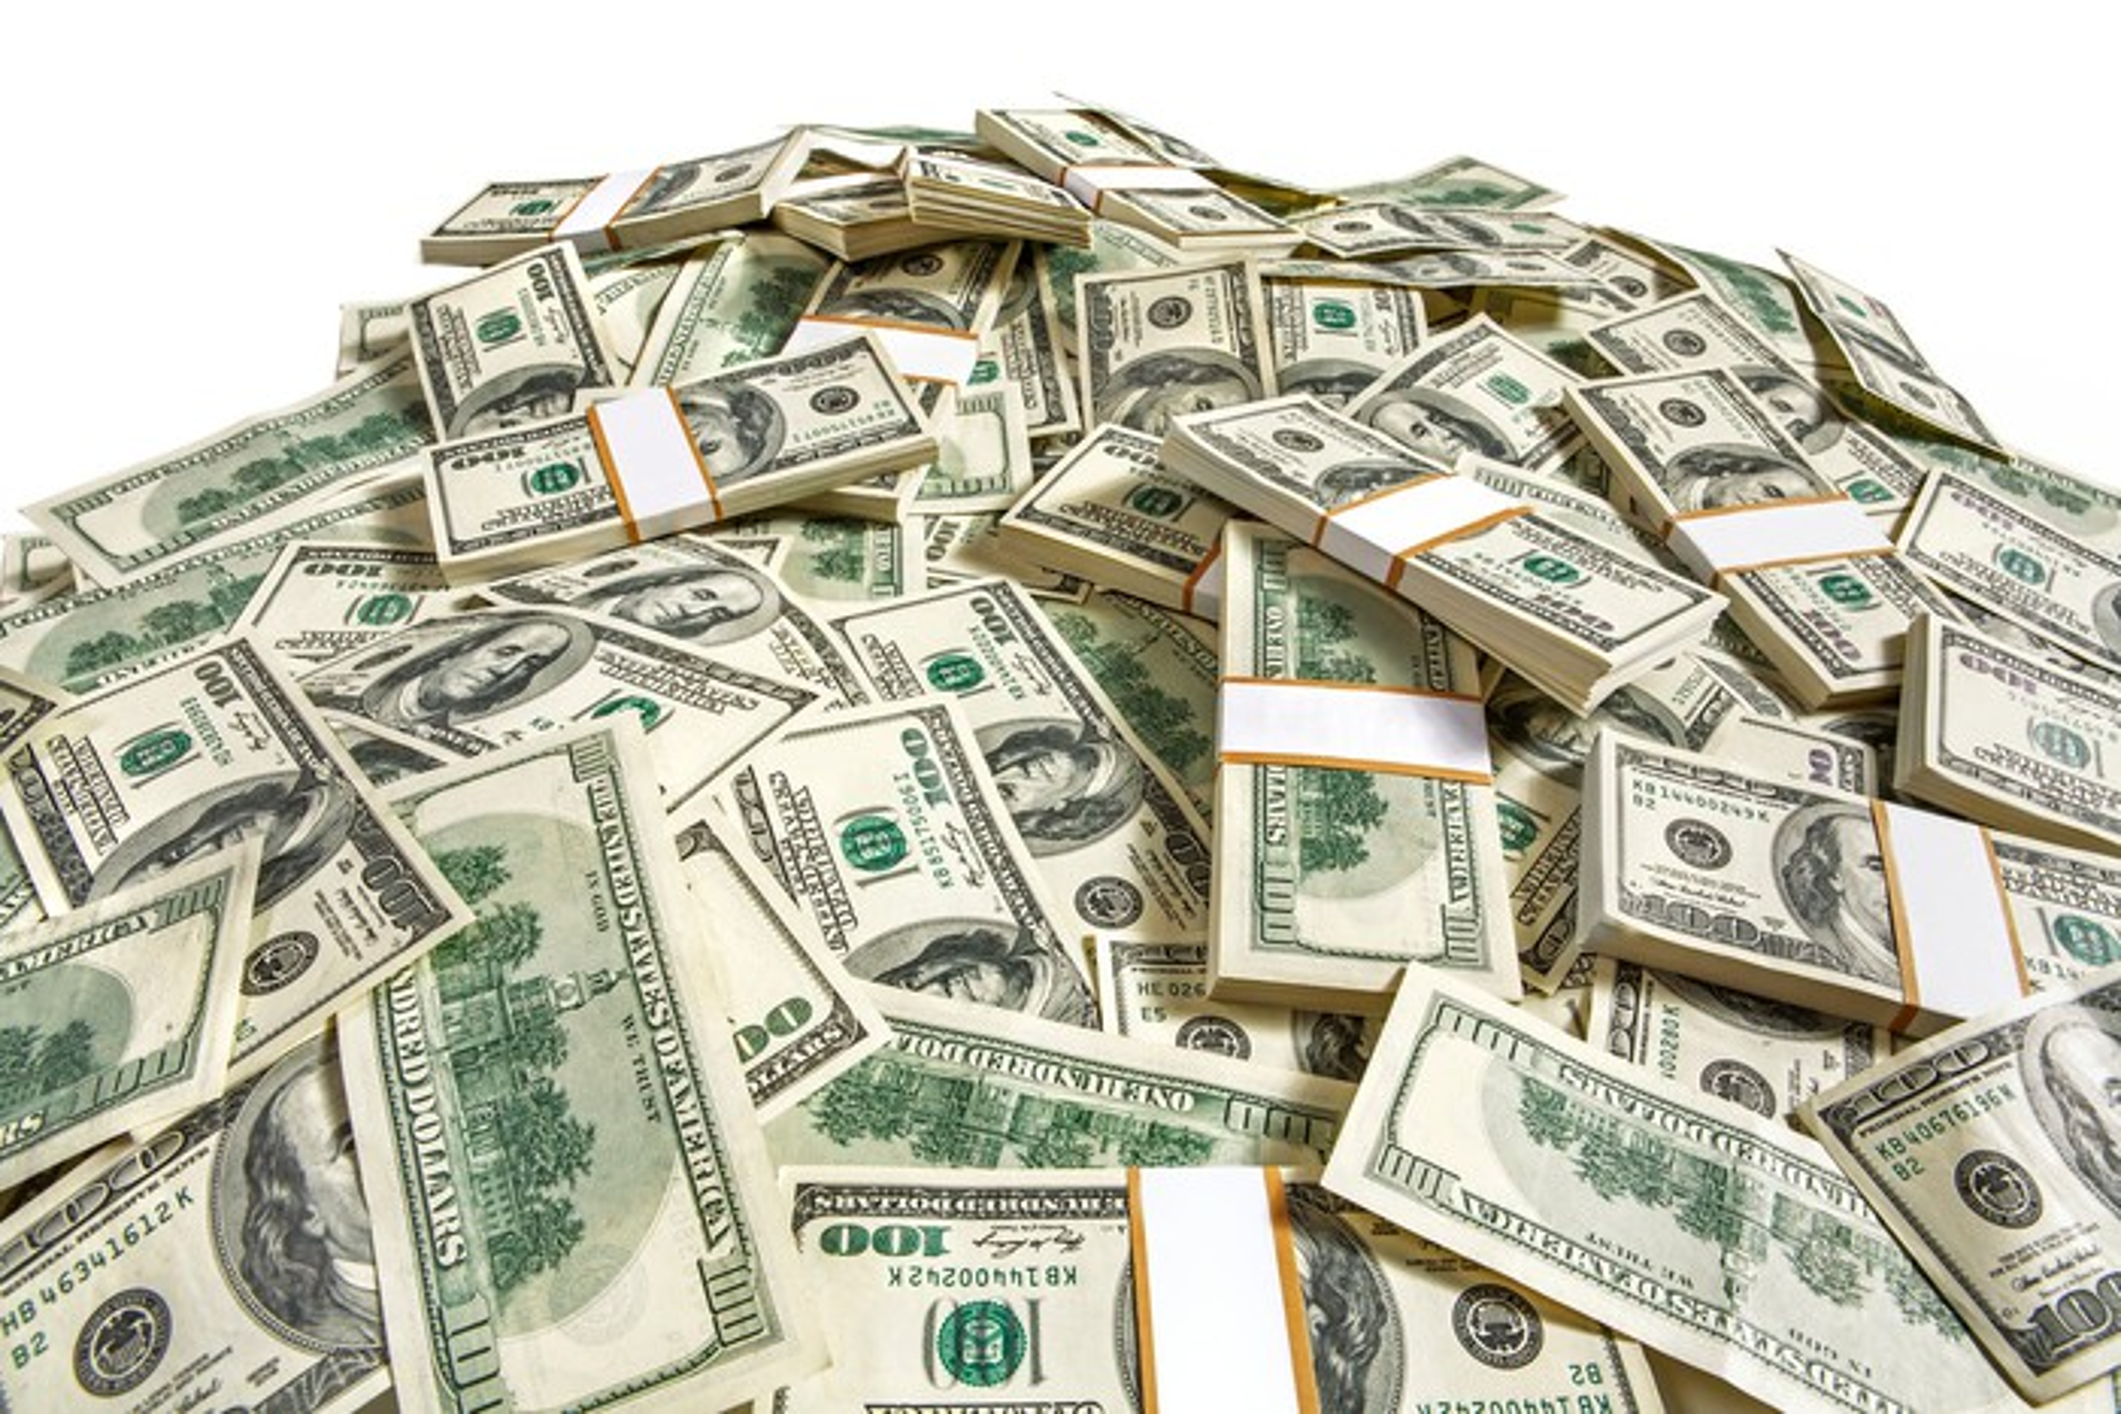 Pile of stacks of $100 bills.